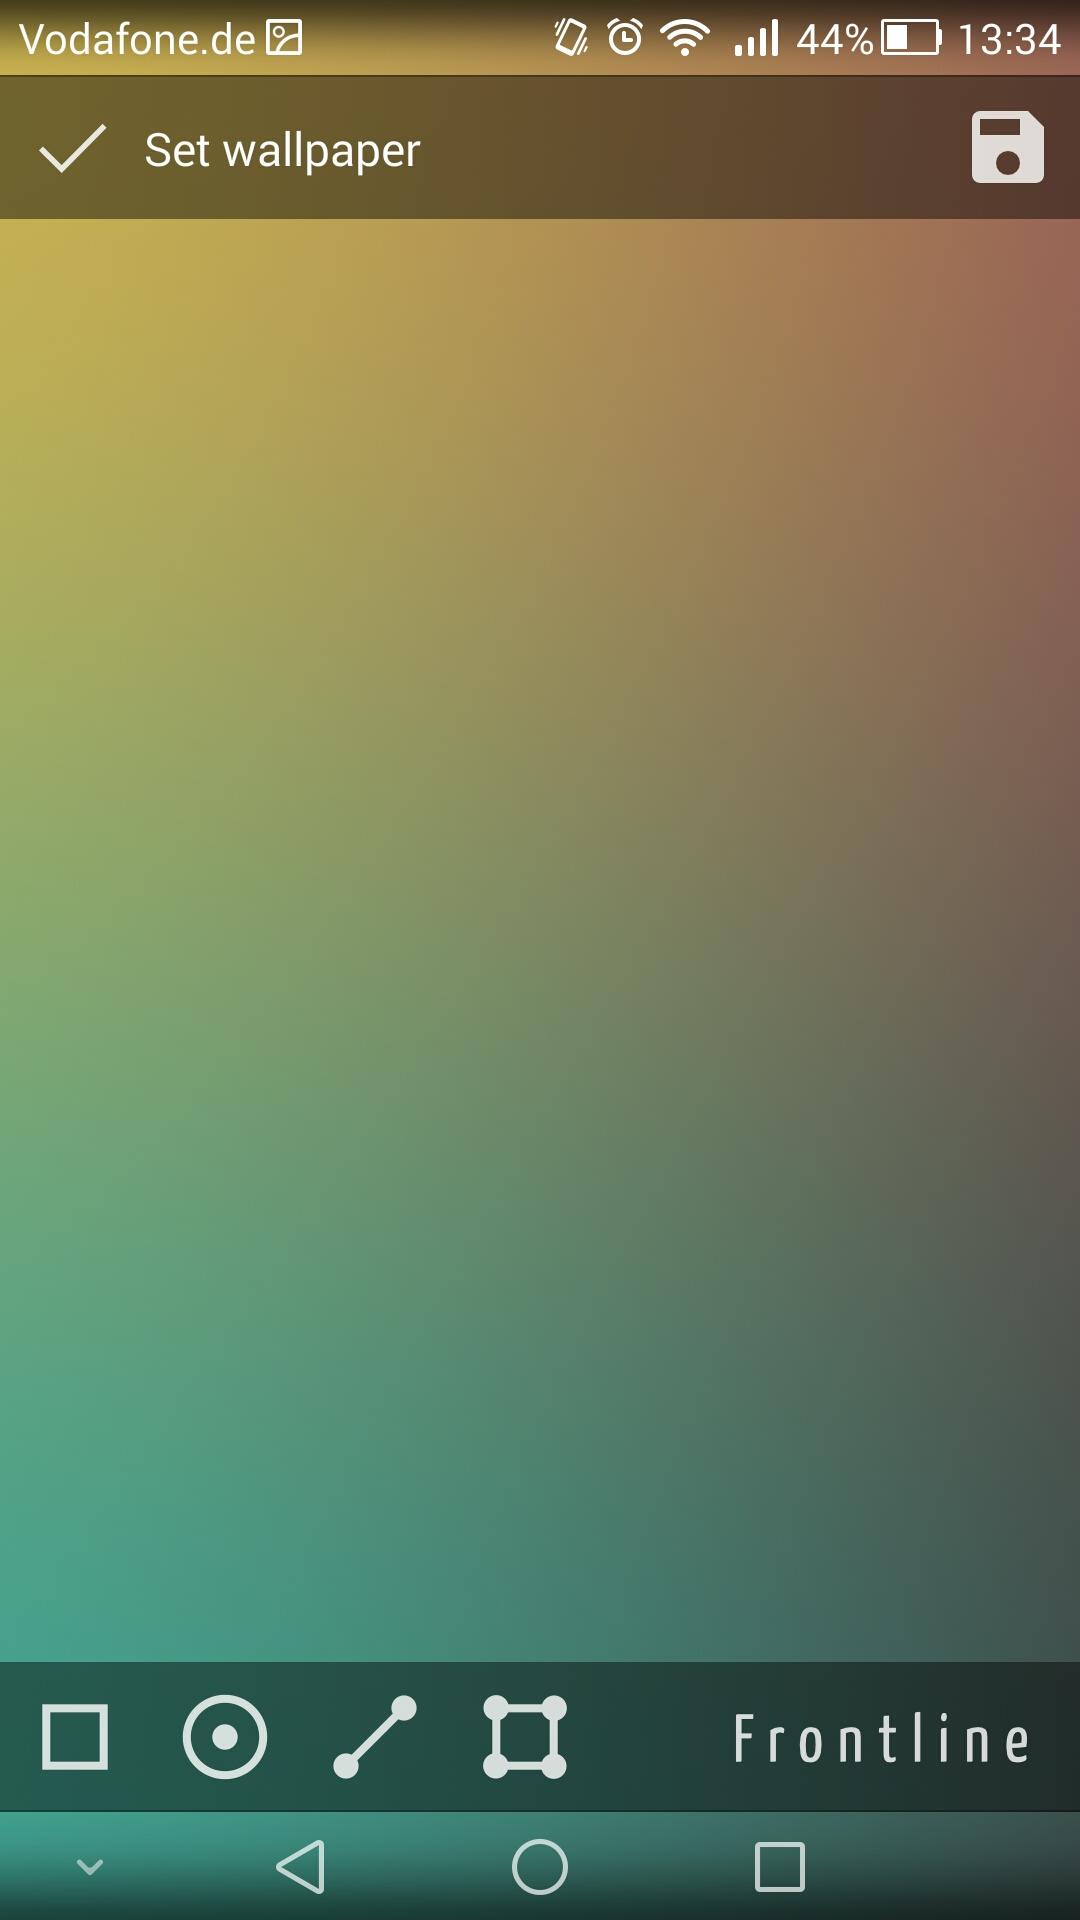 Brashpad f r android abstrakte wallpaper selbst erstellen for Wallpaper erstellen